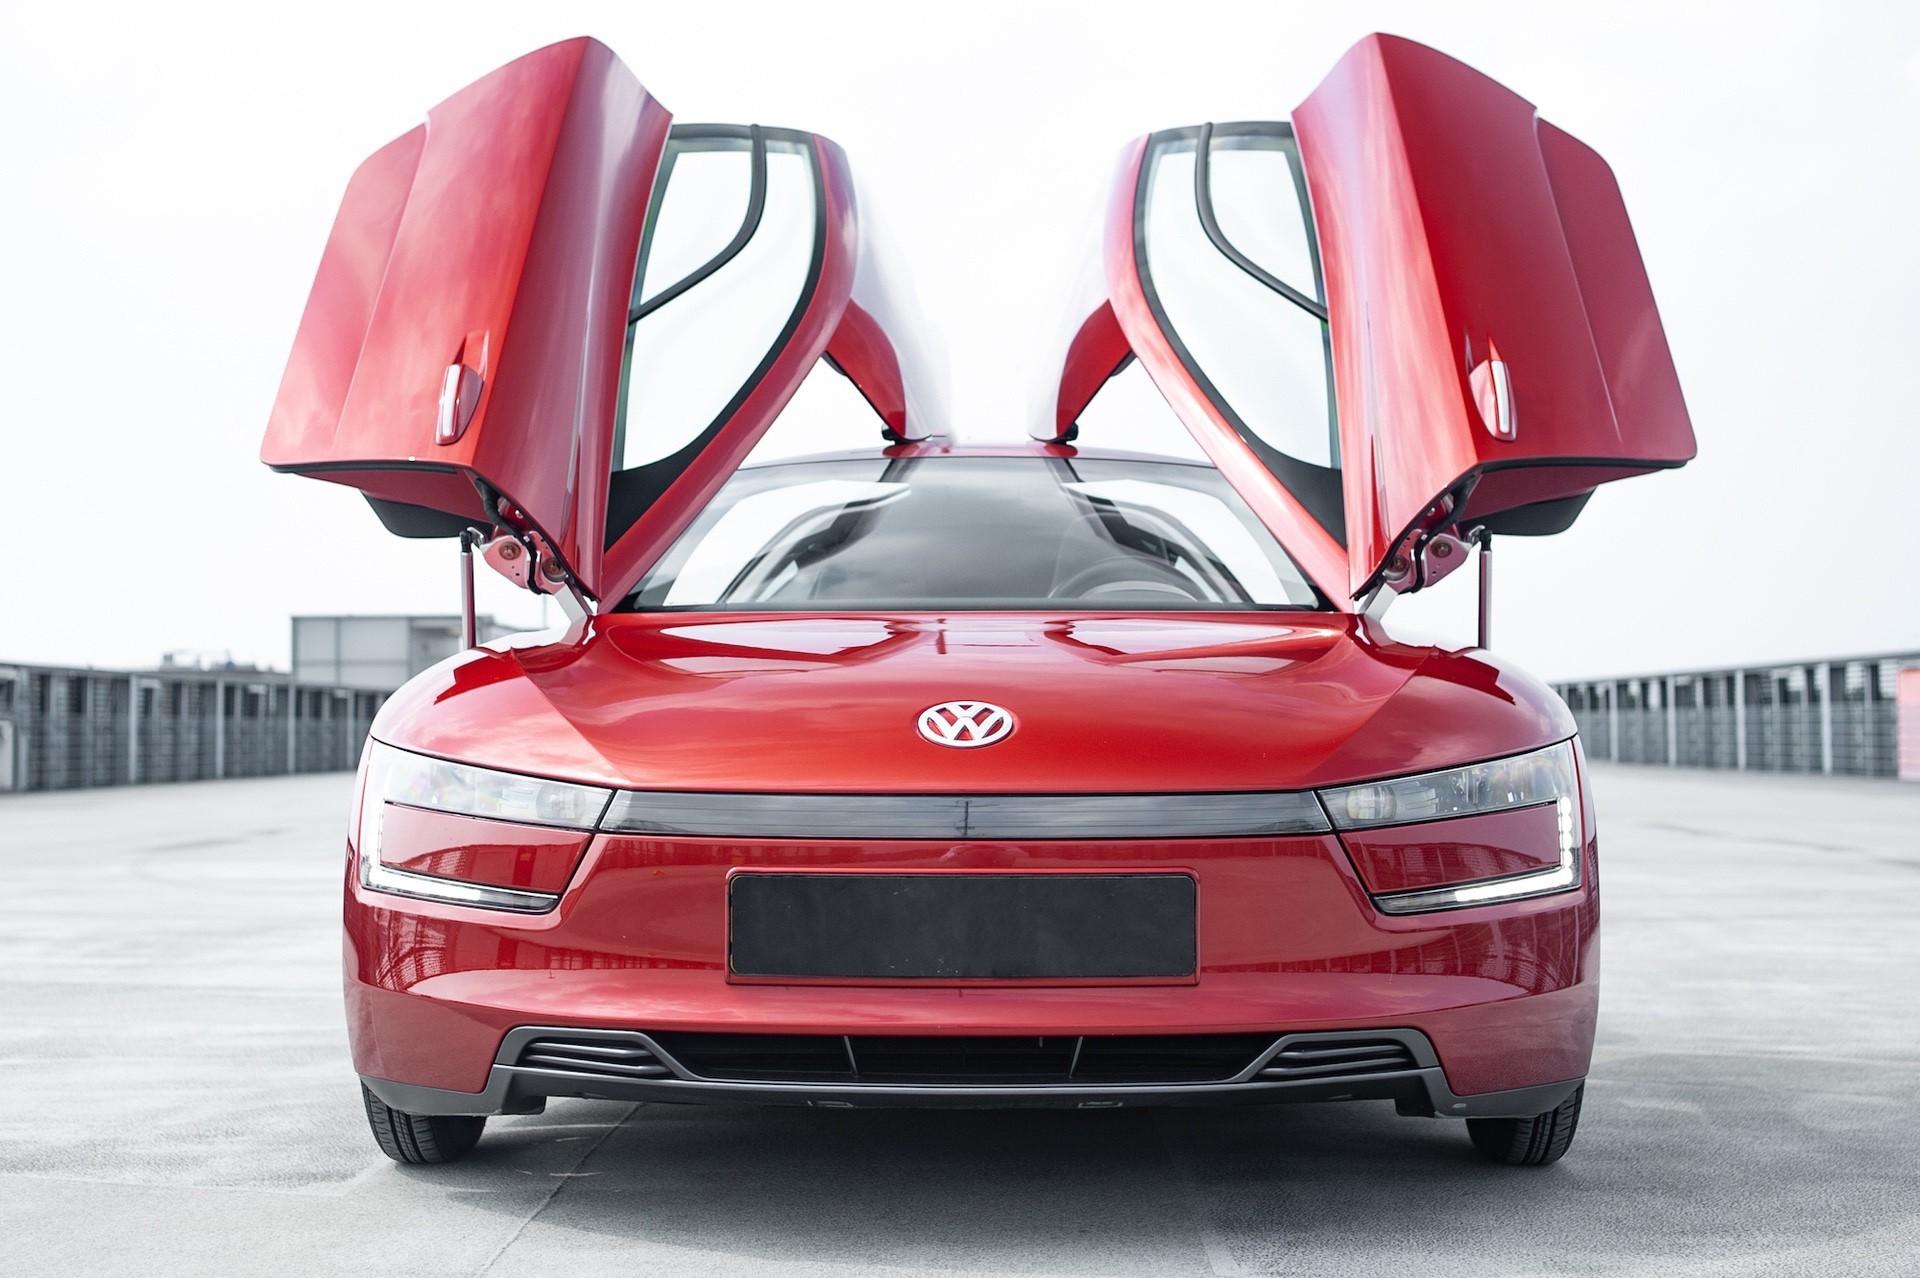 Volkswagen_XL1_sale-0022